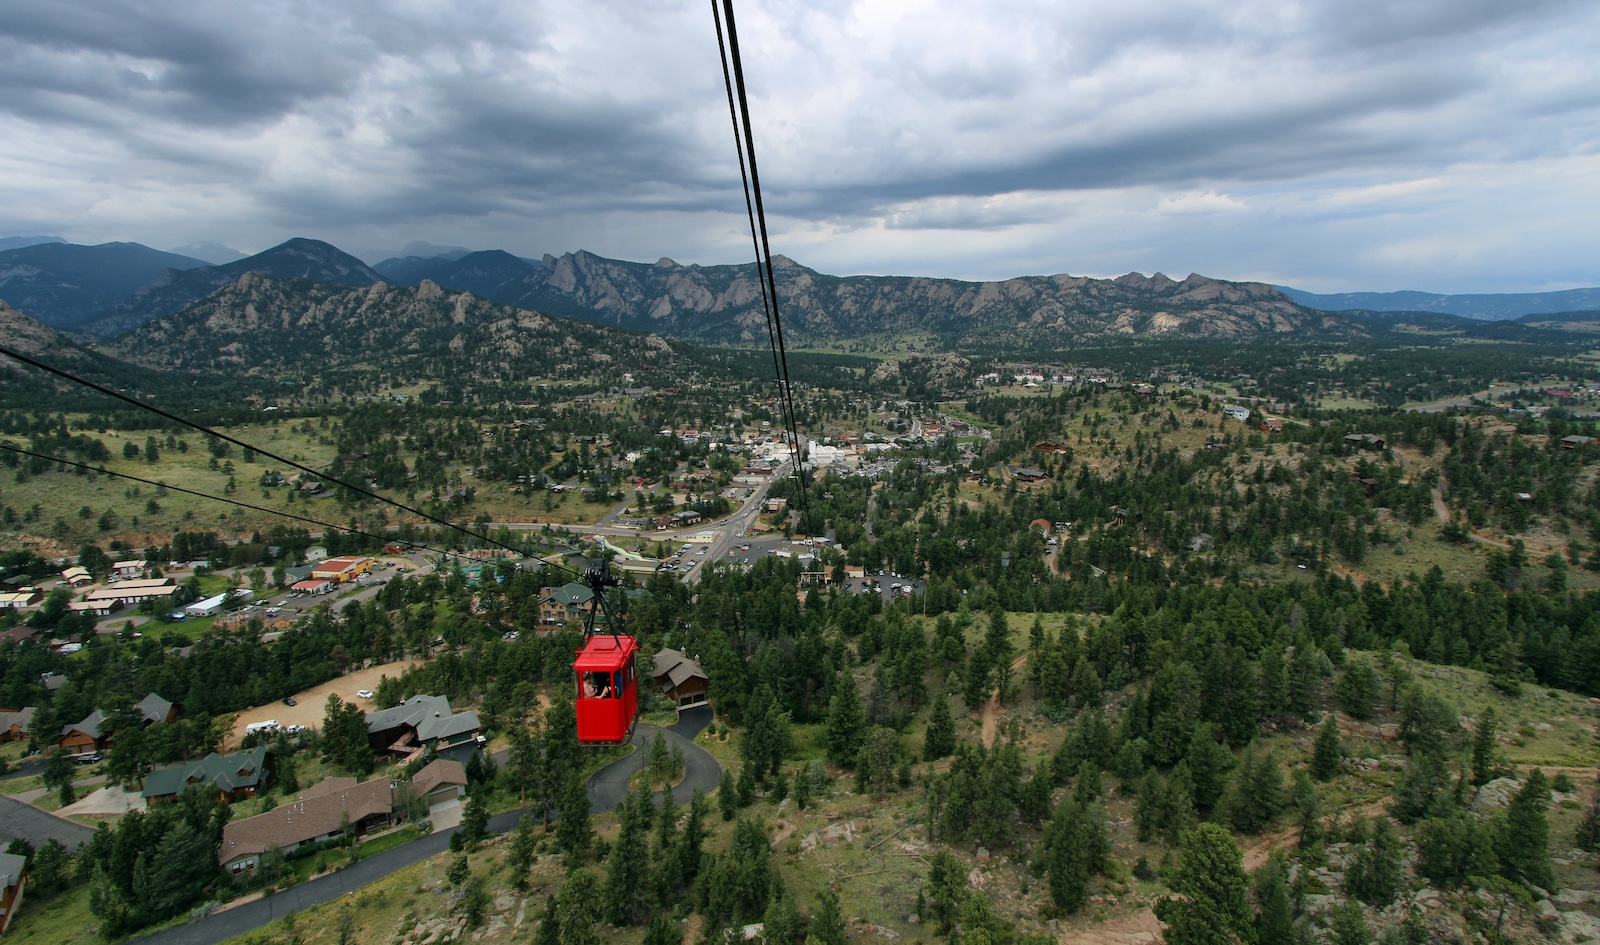 Estes Park Aerial Tramway, CO